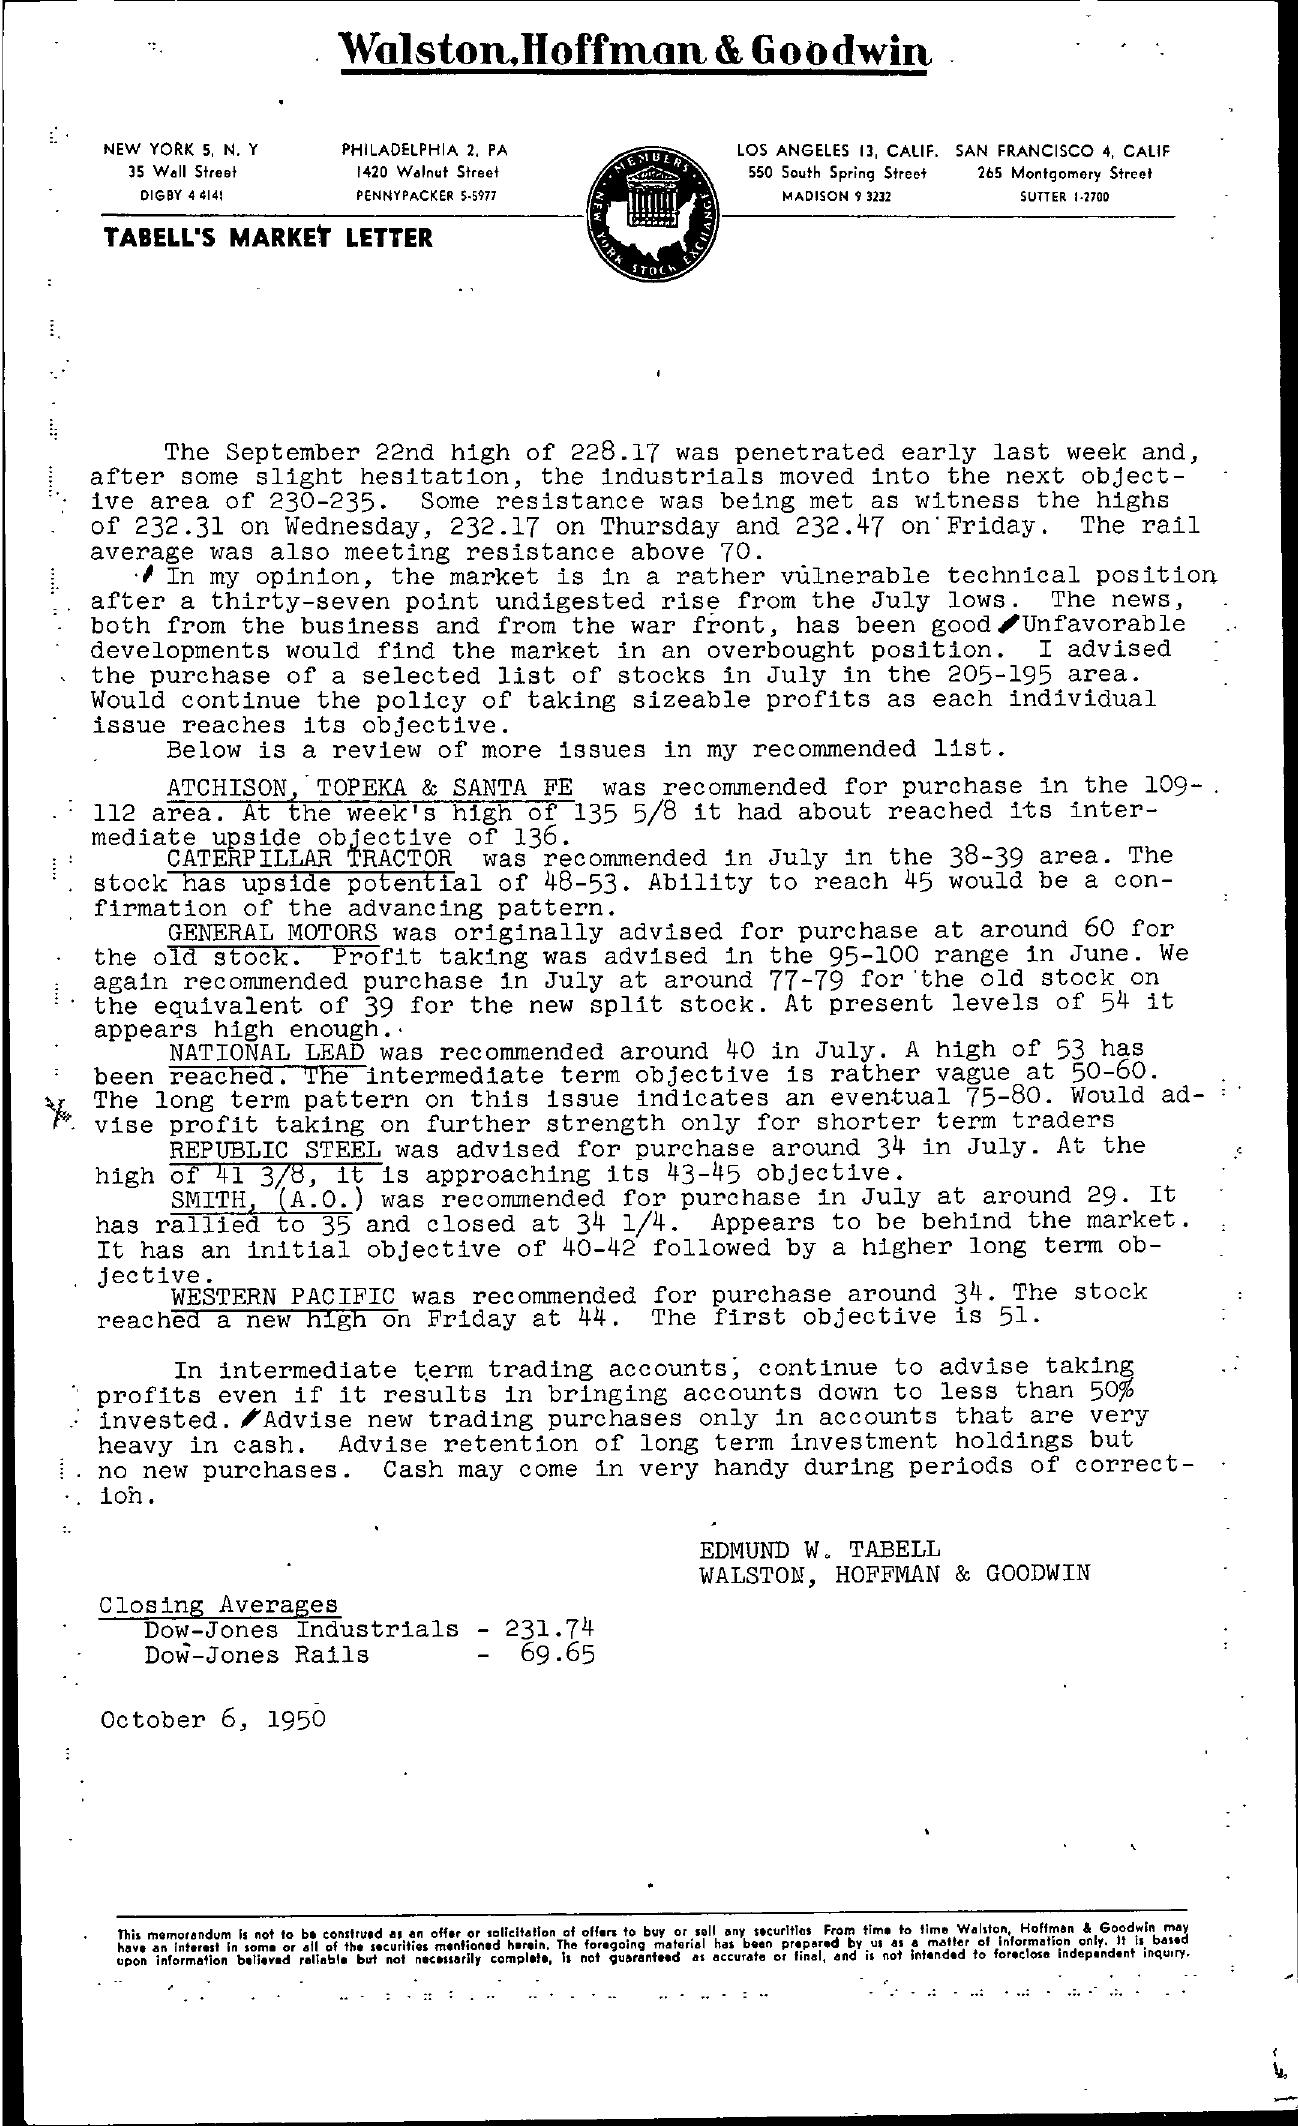 Tabell's Market Letter - October 06, 1950